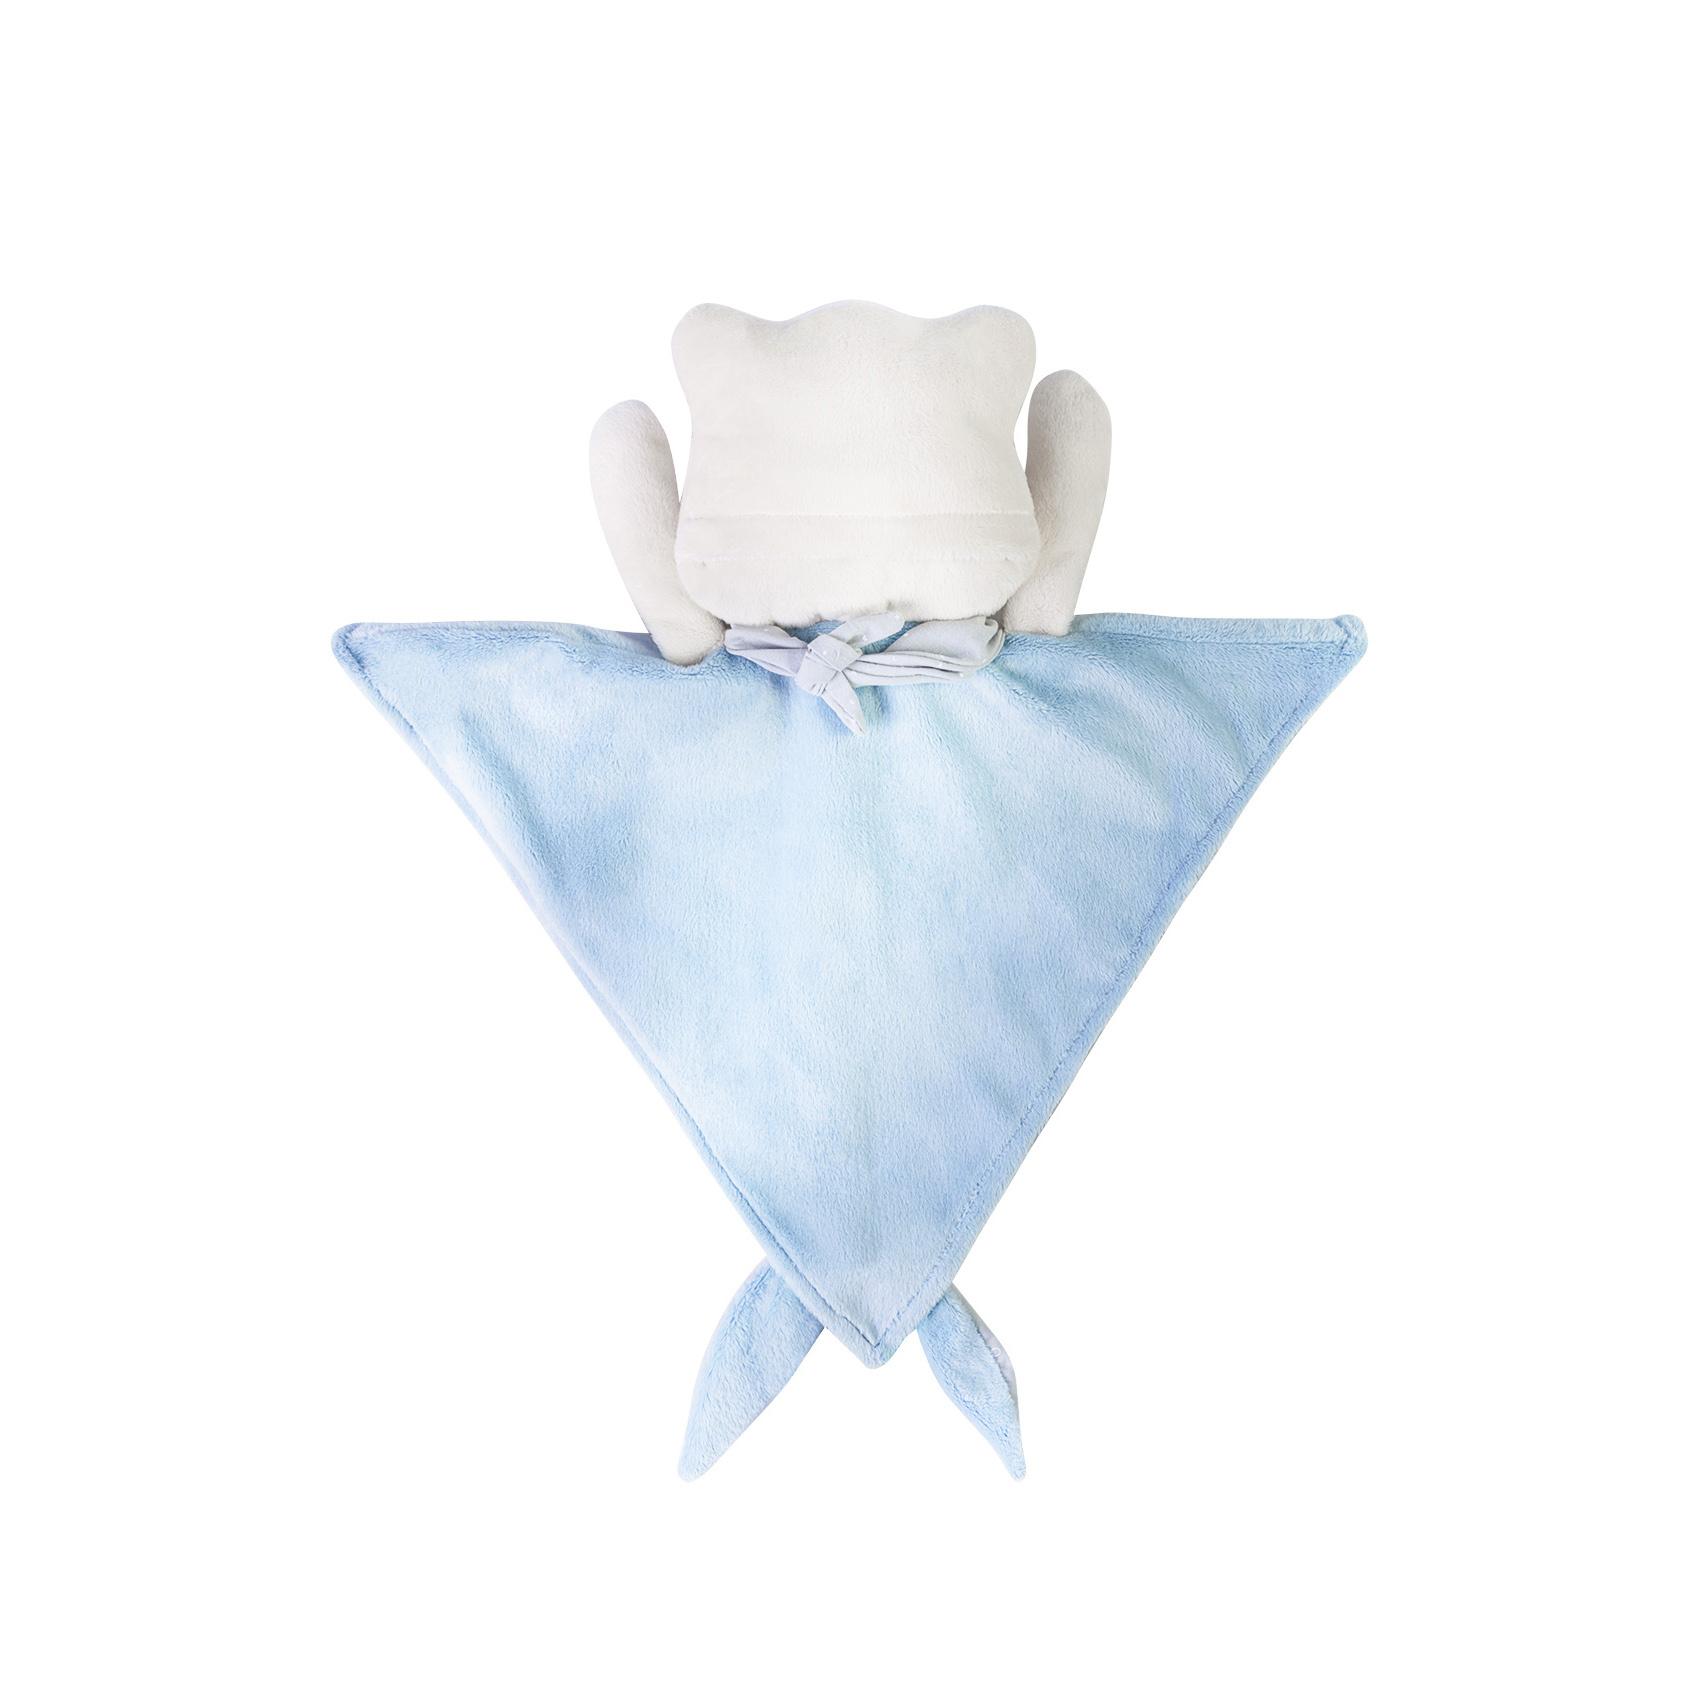 myHummy Doudou Premium - Blau